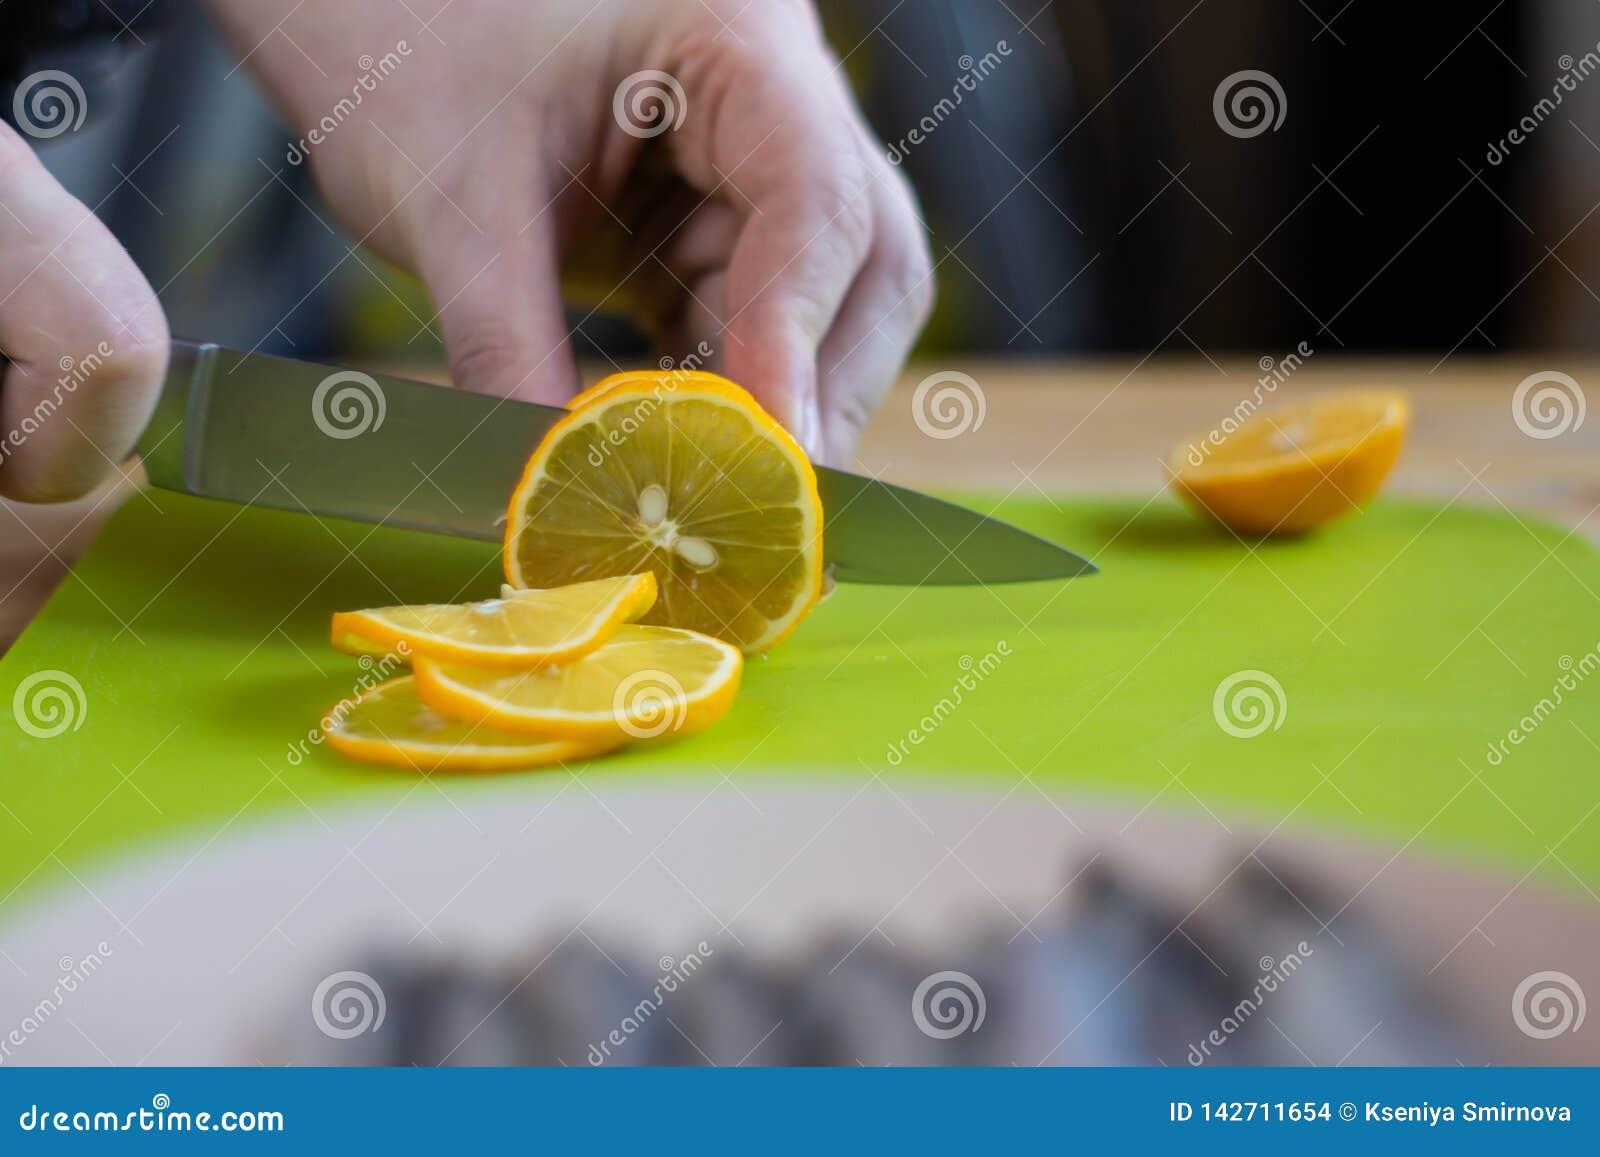 Male hands cut lemon on green cutting board, close up